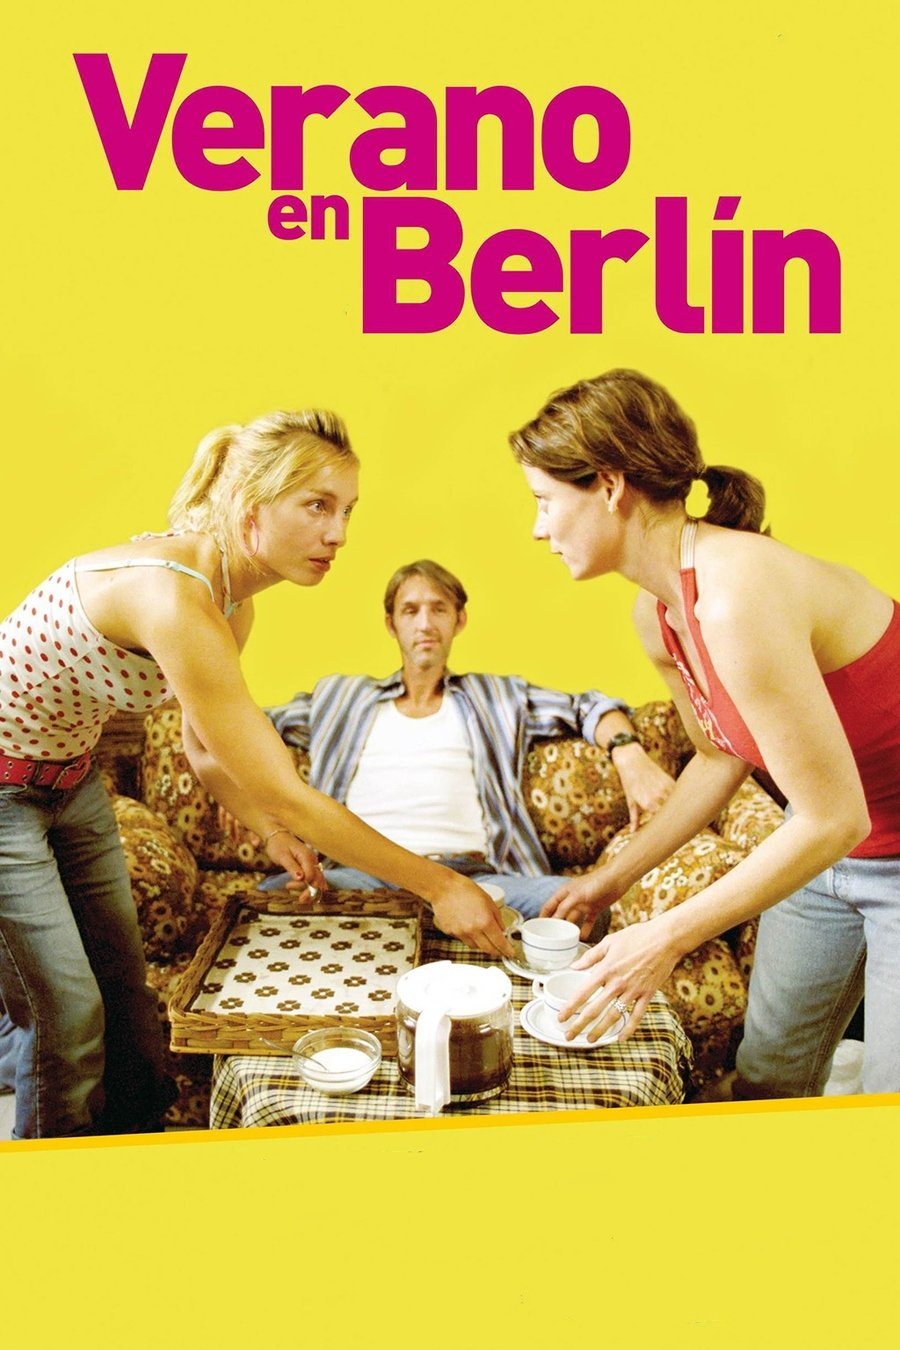 Verano en Berlín